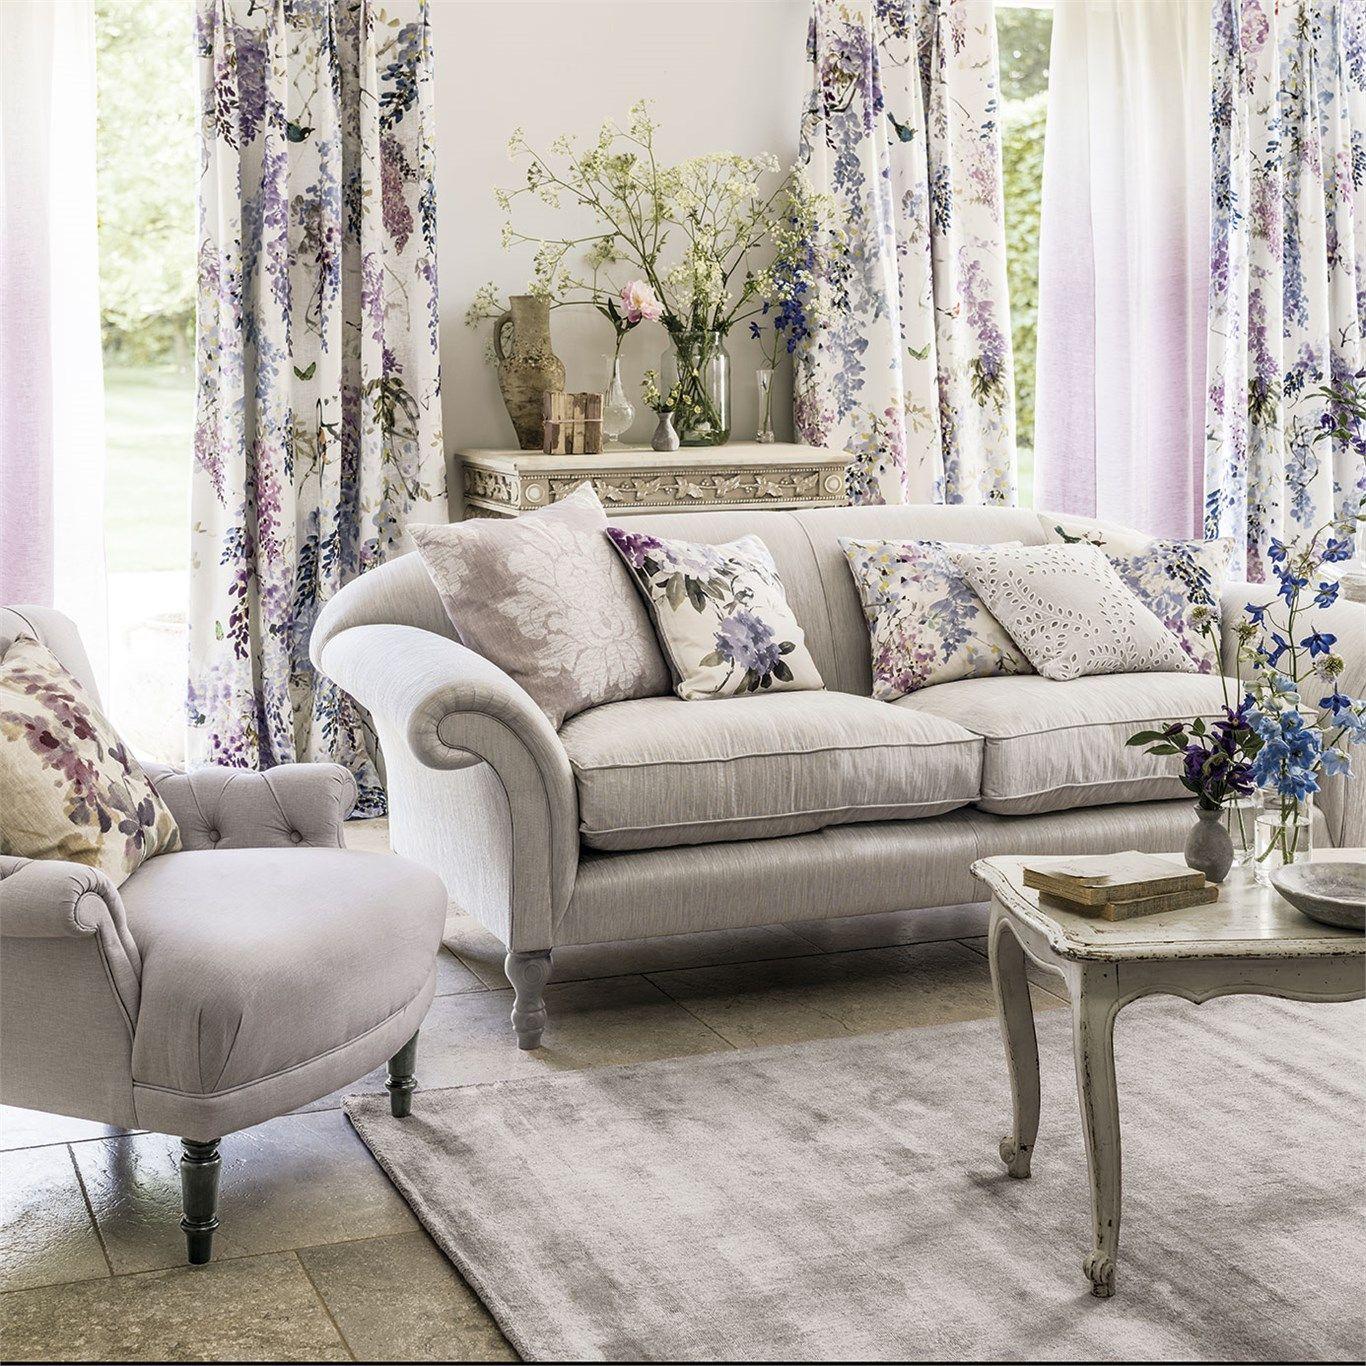 Sanderson Fabric Wisteria Falls 226286 Home, living